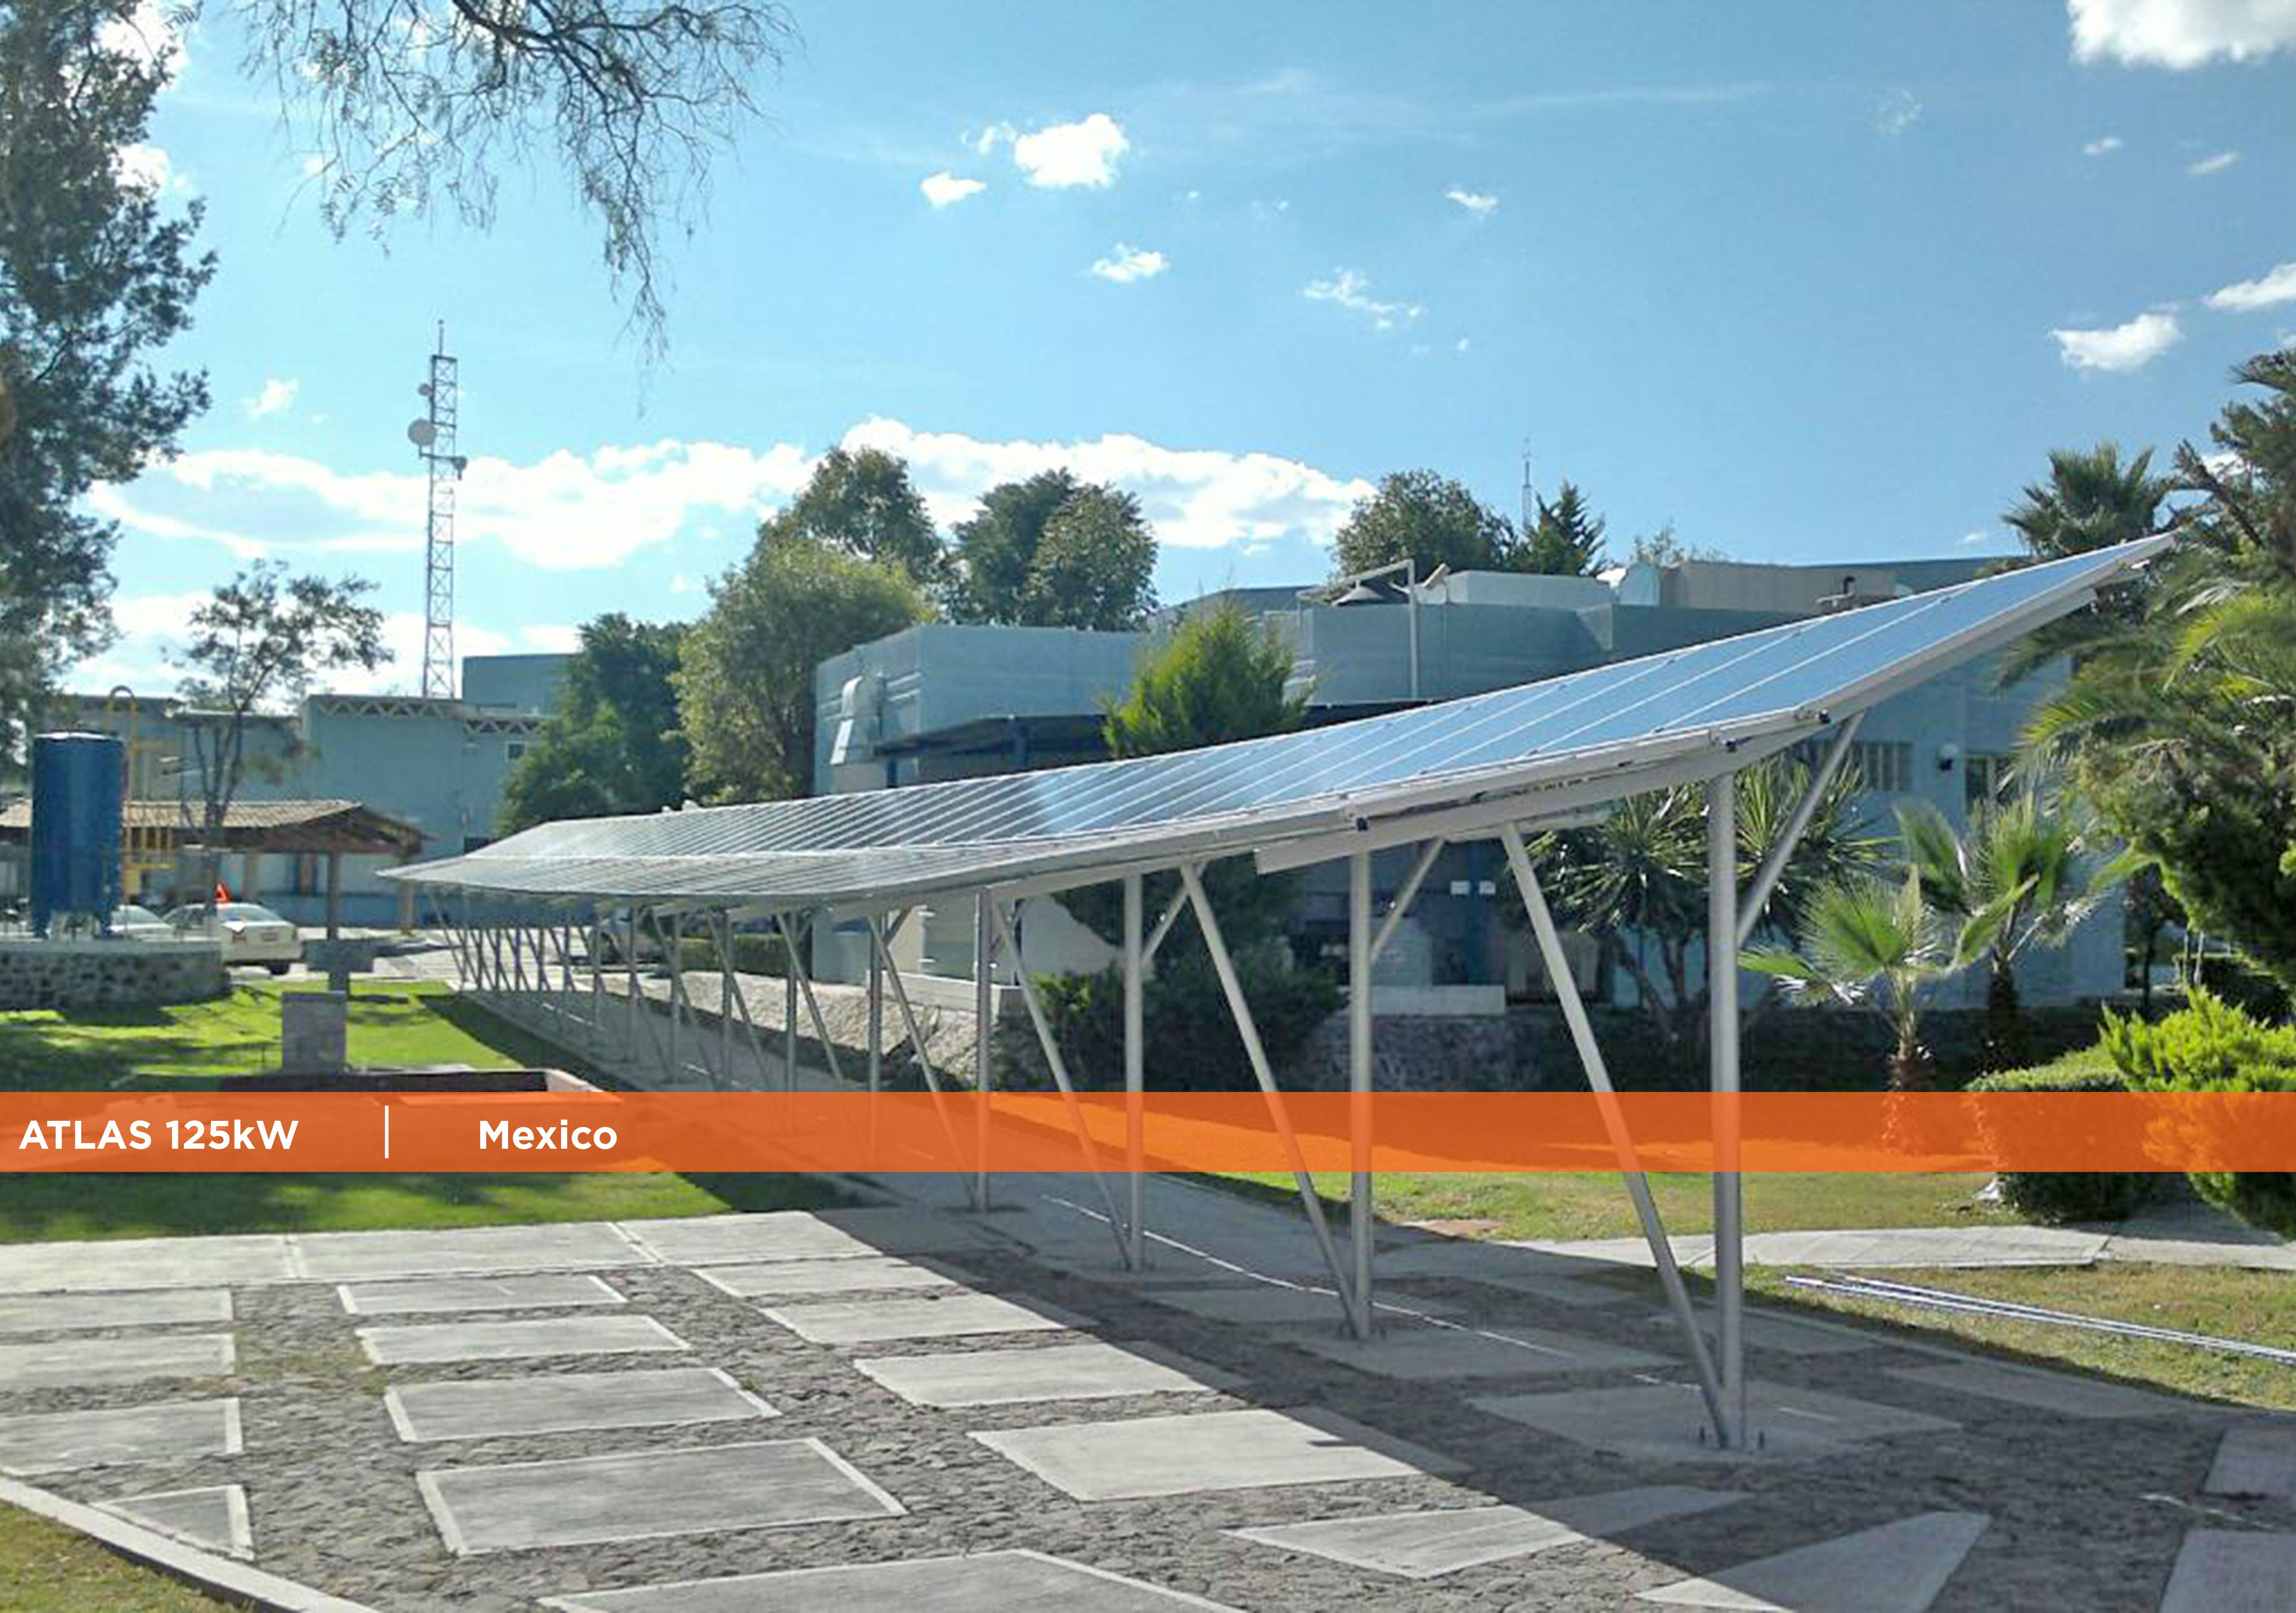 Symtech Solar - Newsletter October 2016-Atlas 125kW Mexico